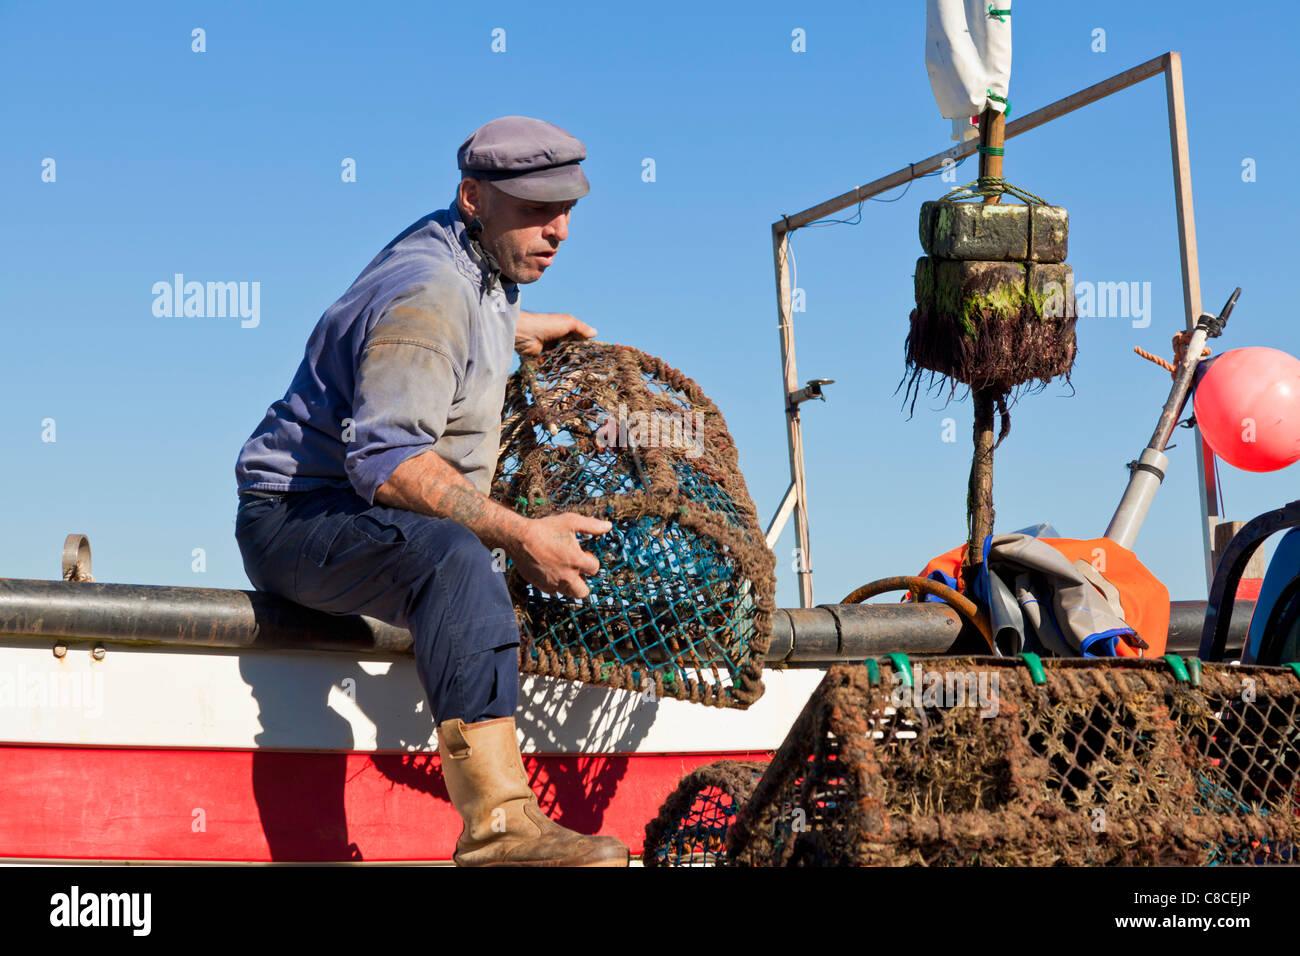 Fisherman taking crab pots off his fishing boat Cromer Norfolk East Anglia England UK GB EU Europe - Stock Image